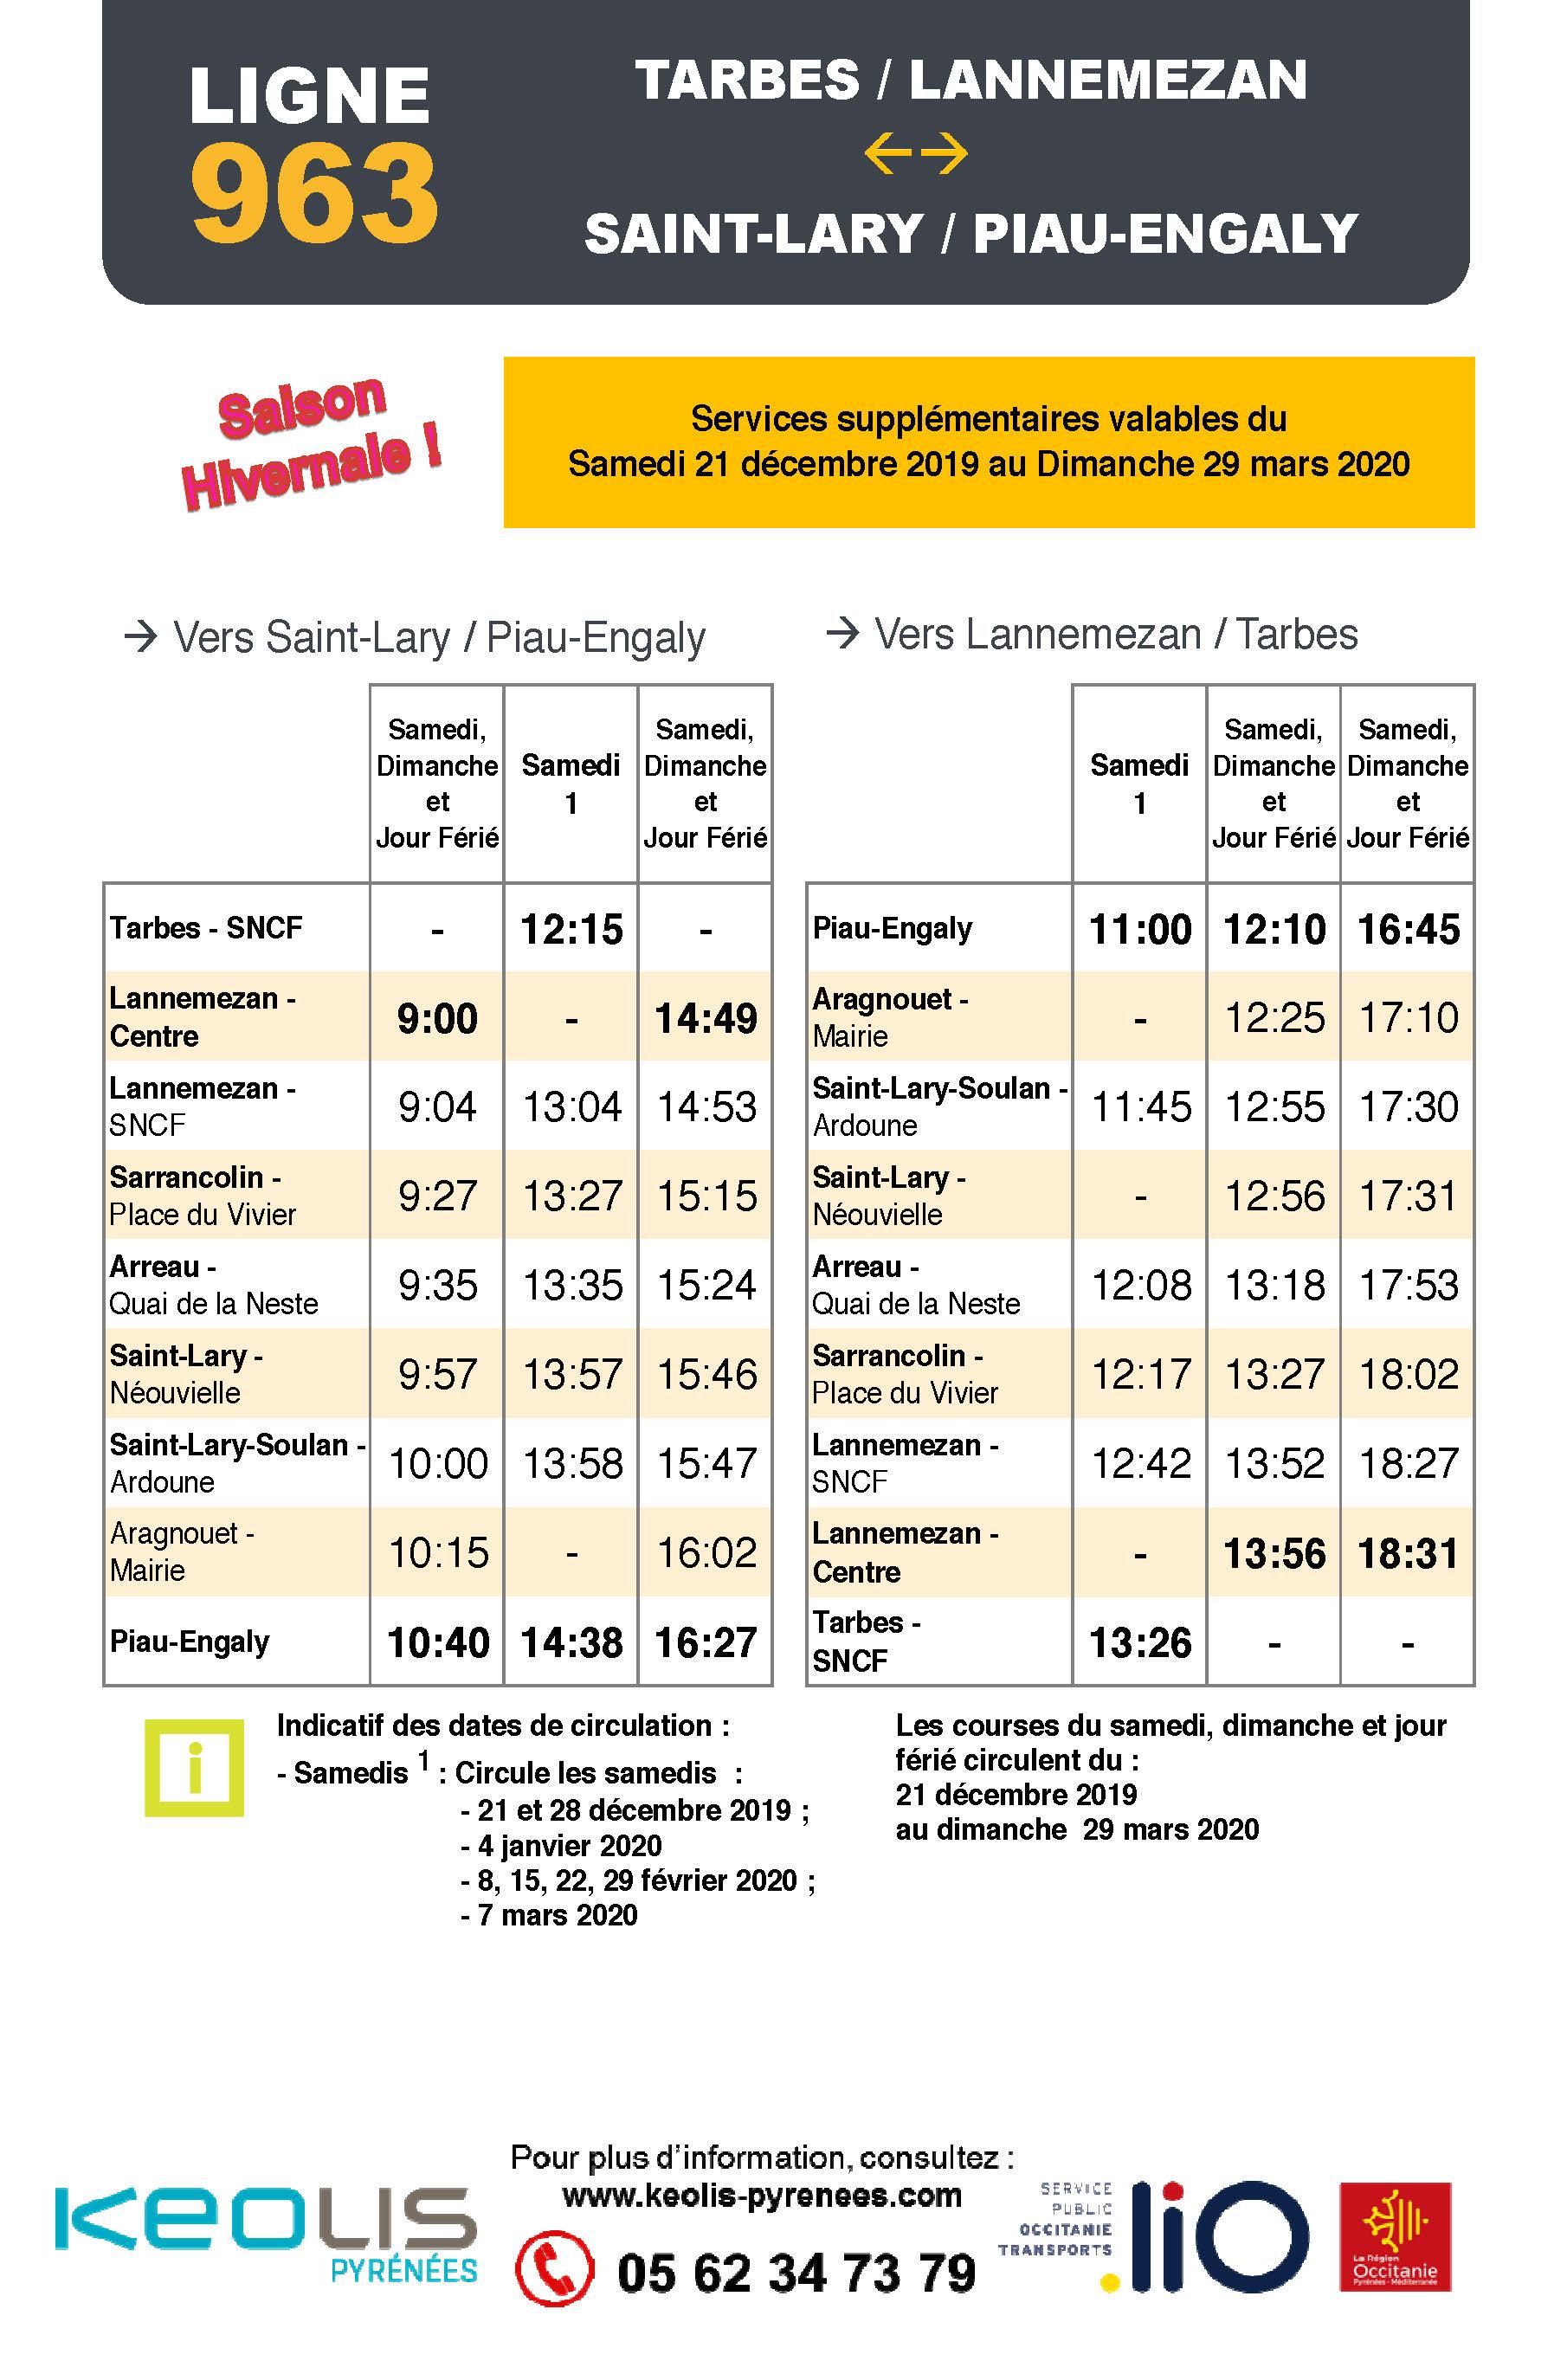 Ligne_963_saison_hivernale_2019_2020.jpg